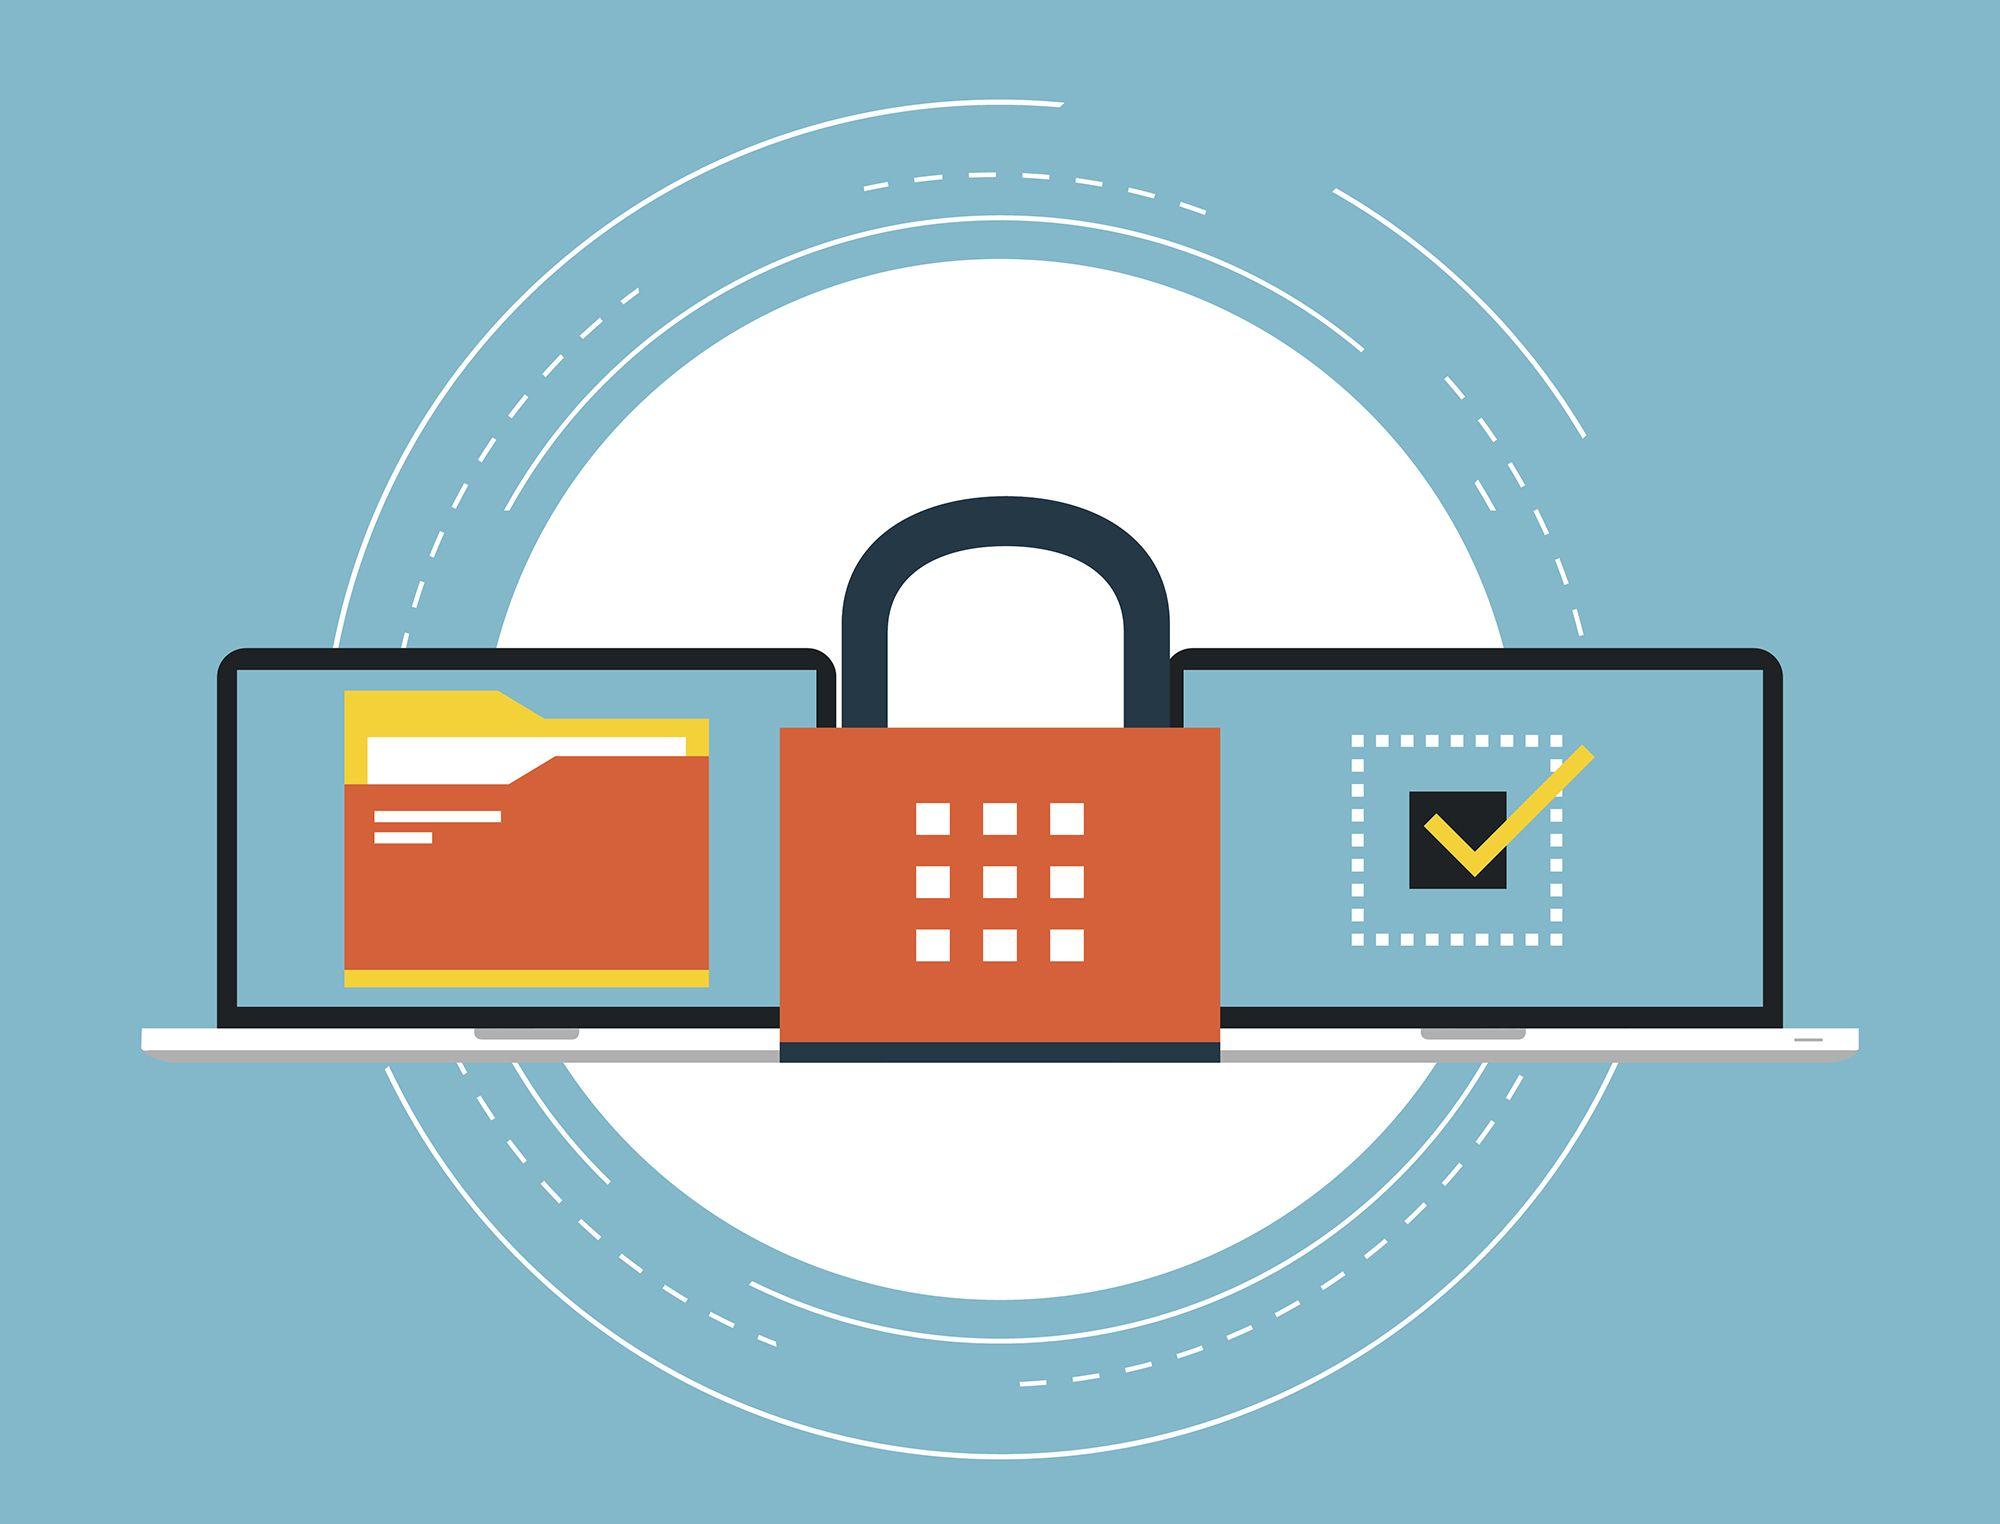 File Sharing Security Risks & Tips on Secure File Exchange